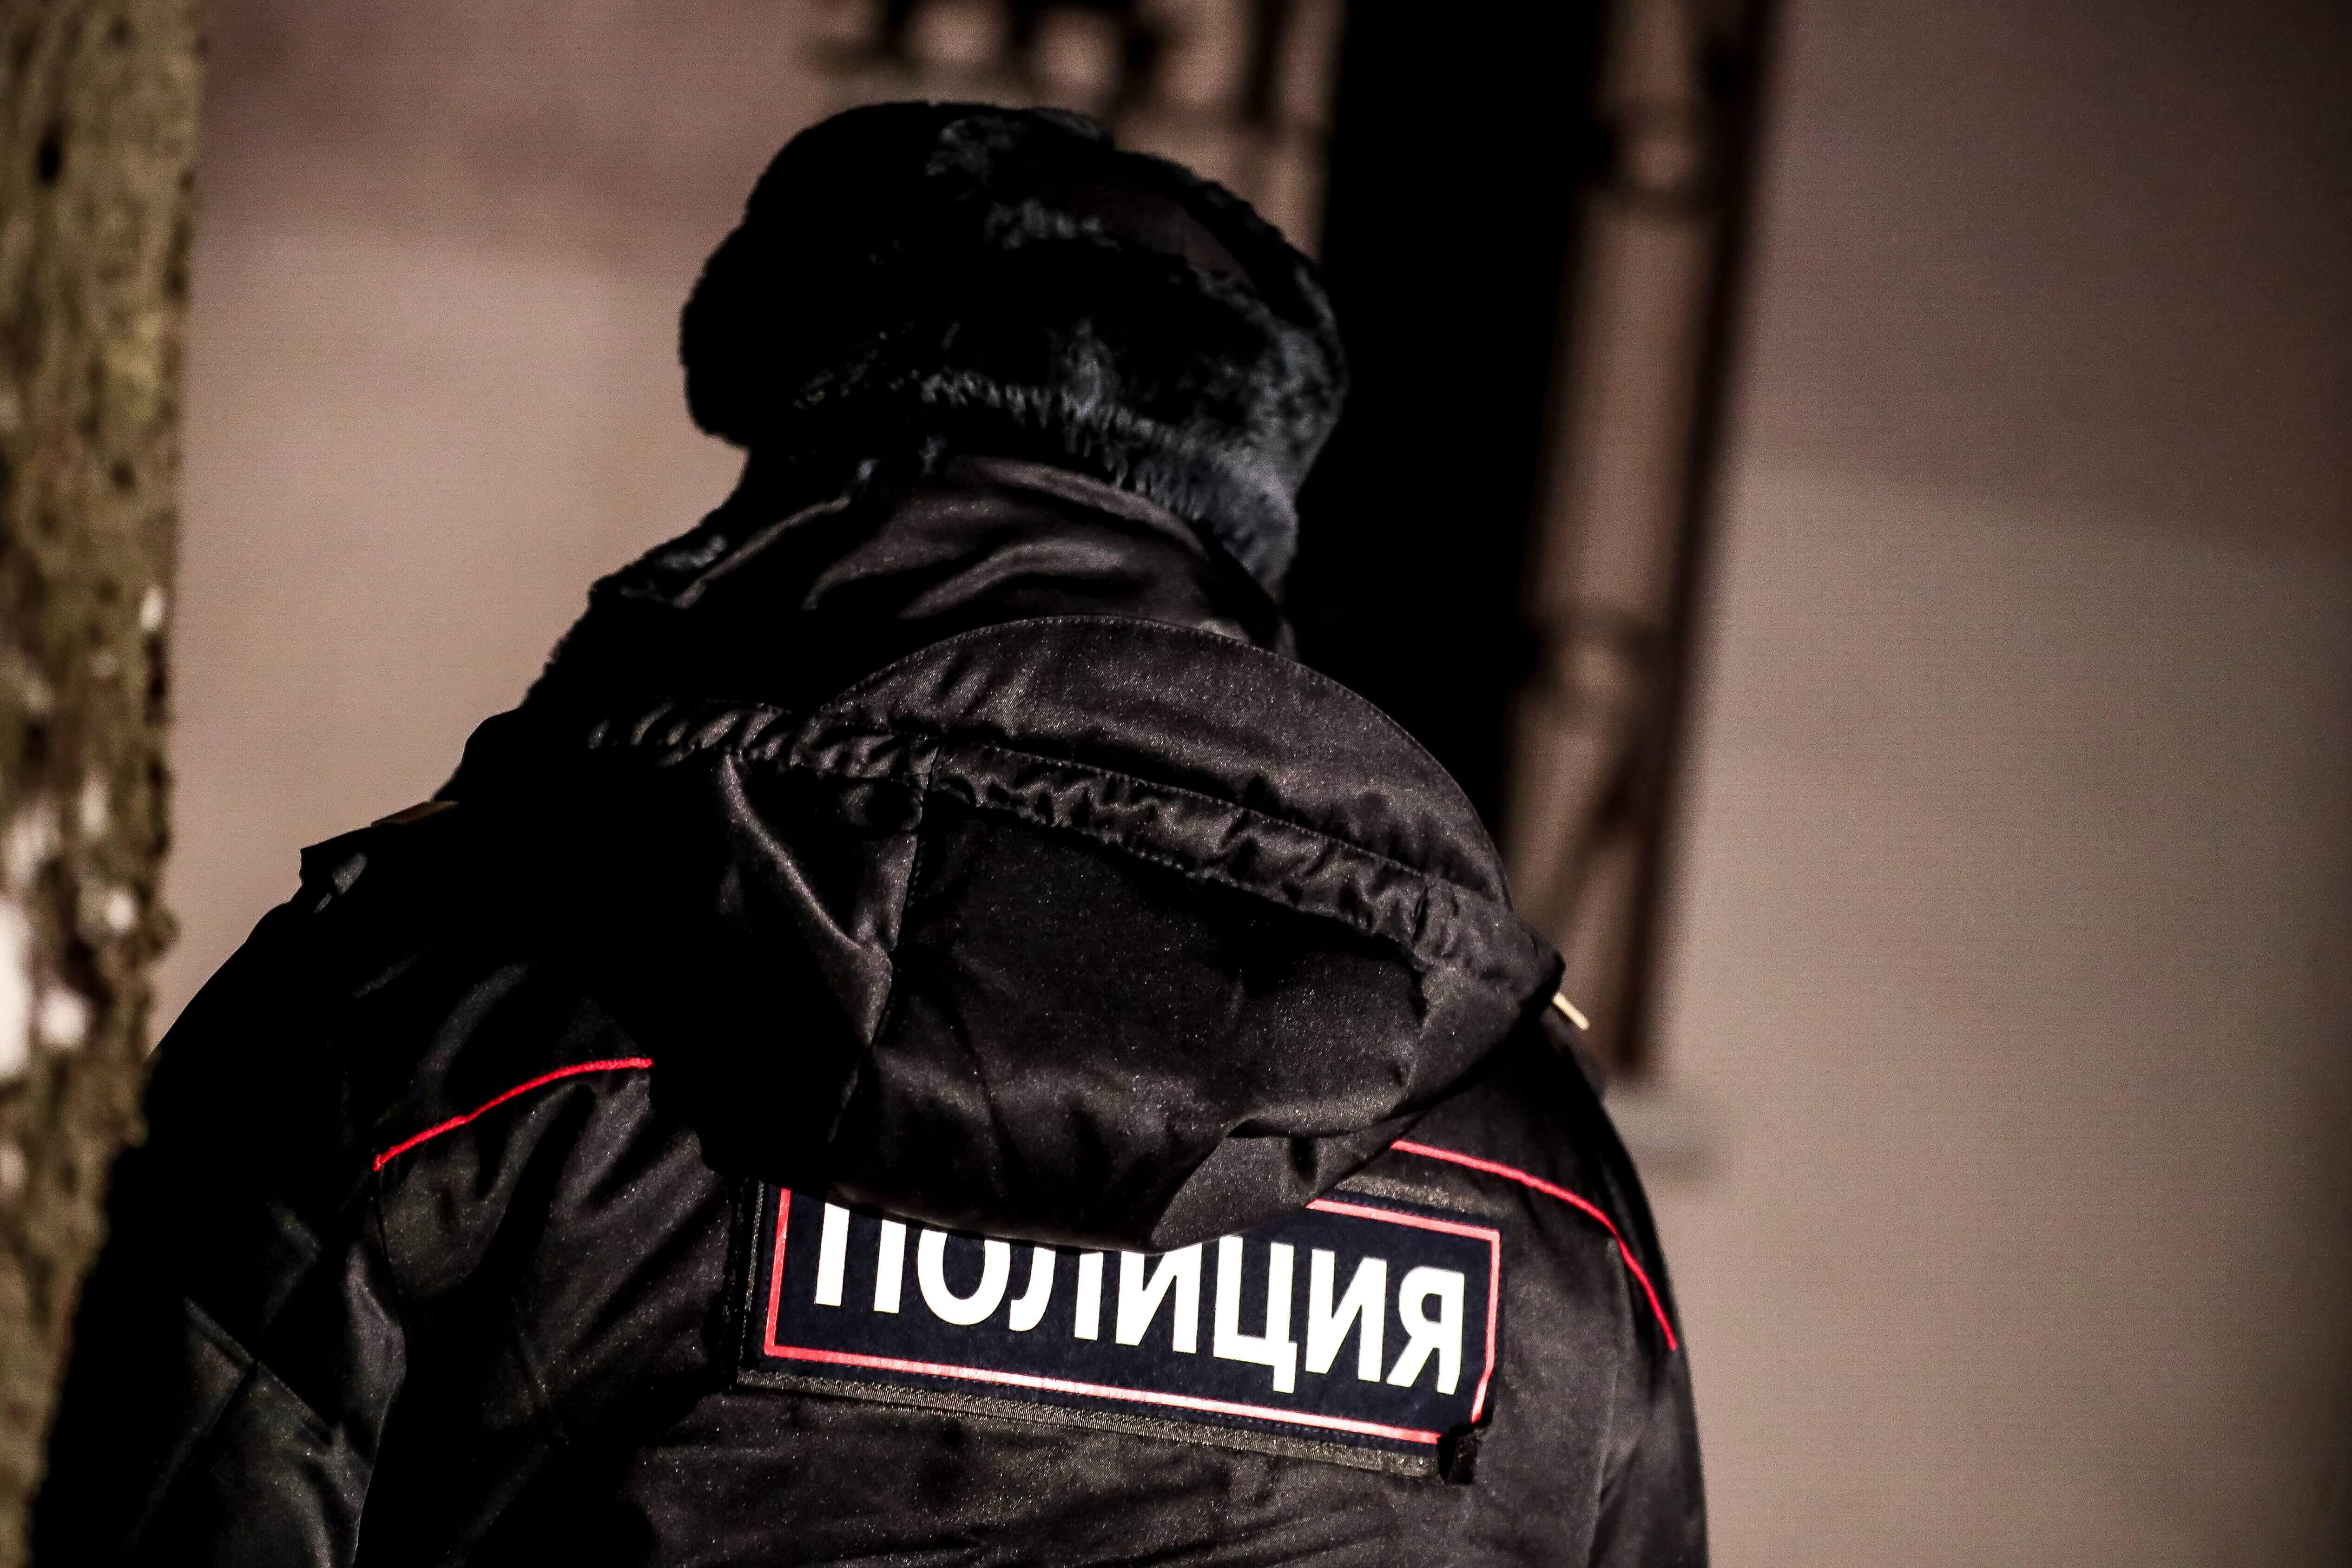 Dmitry Golubovich/Global Look Press